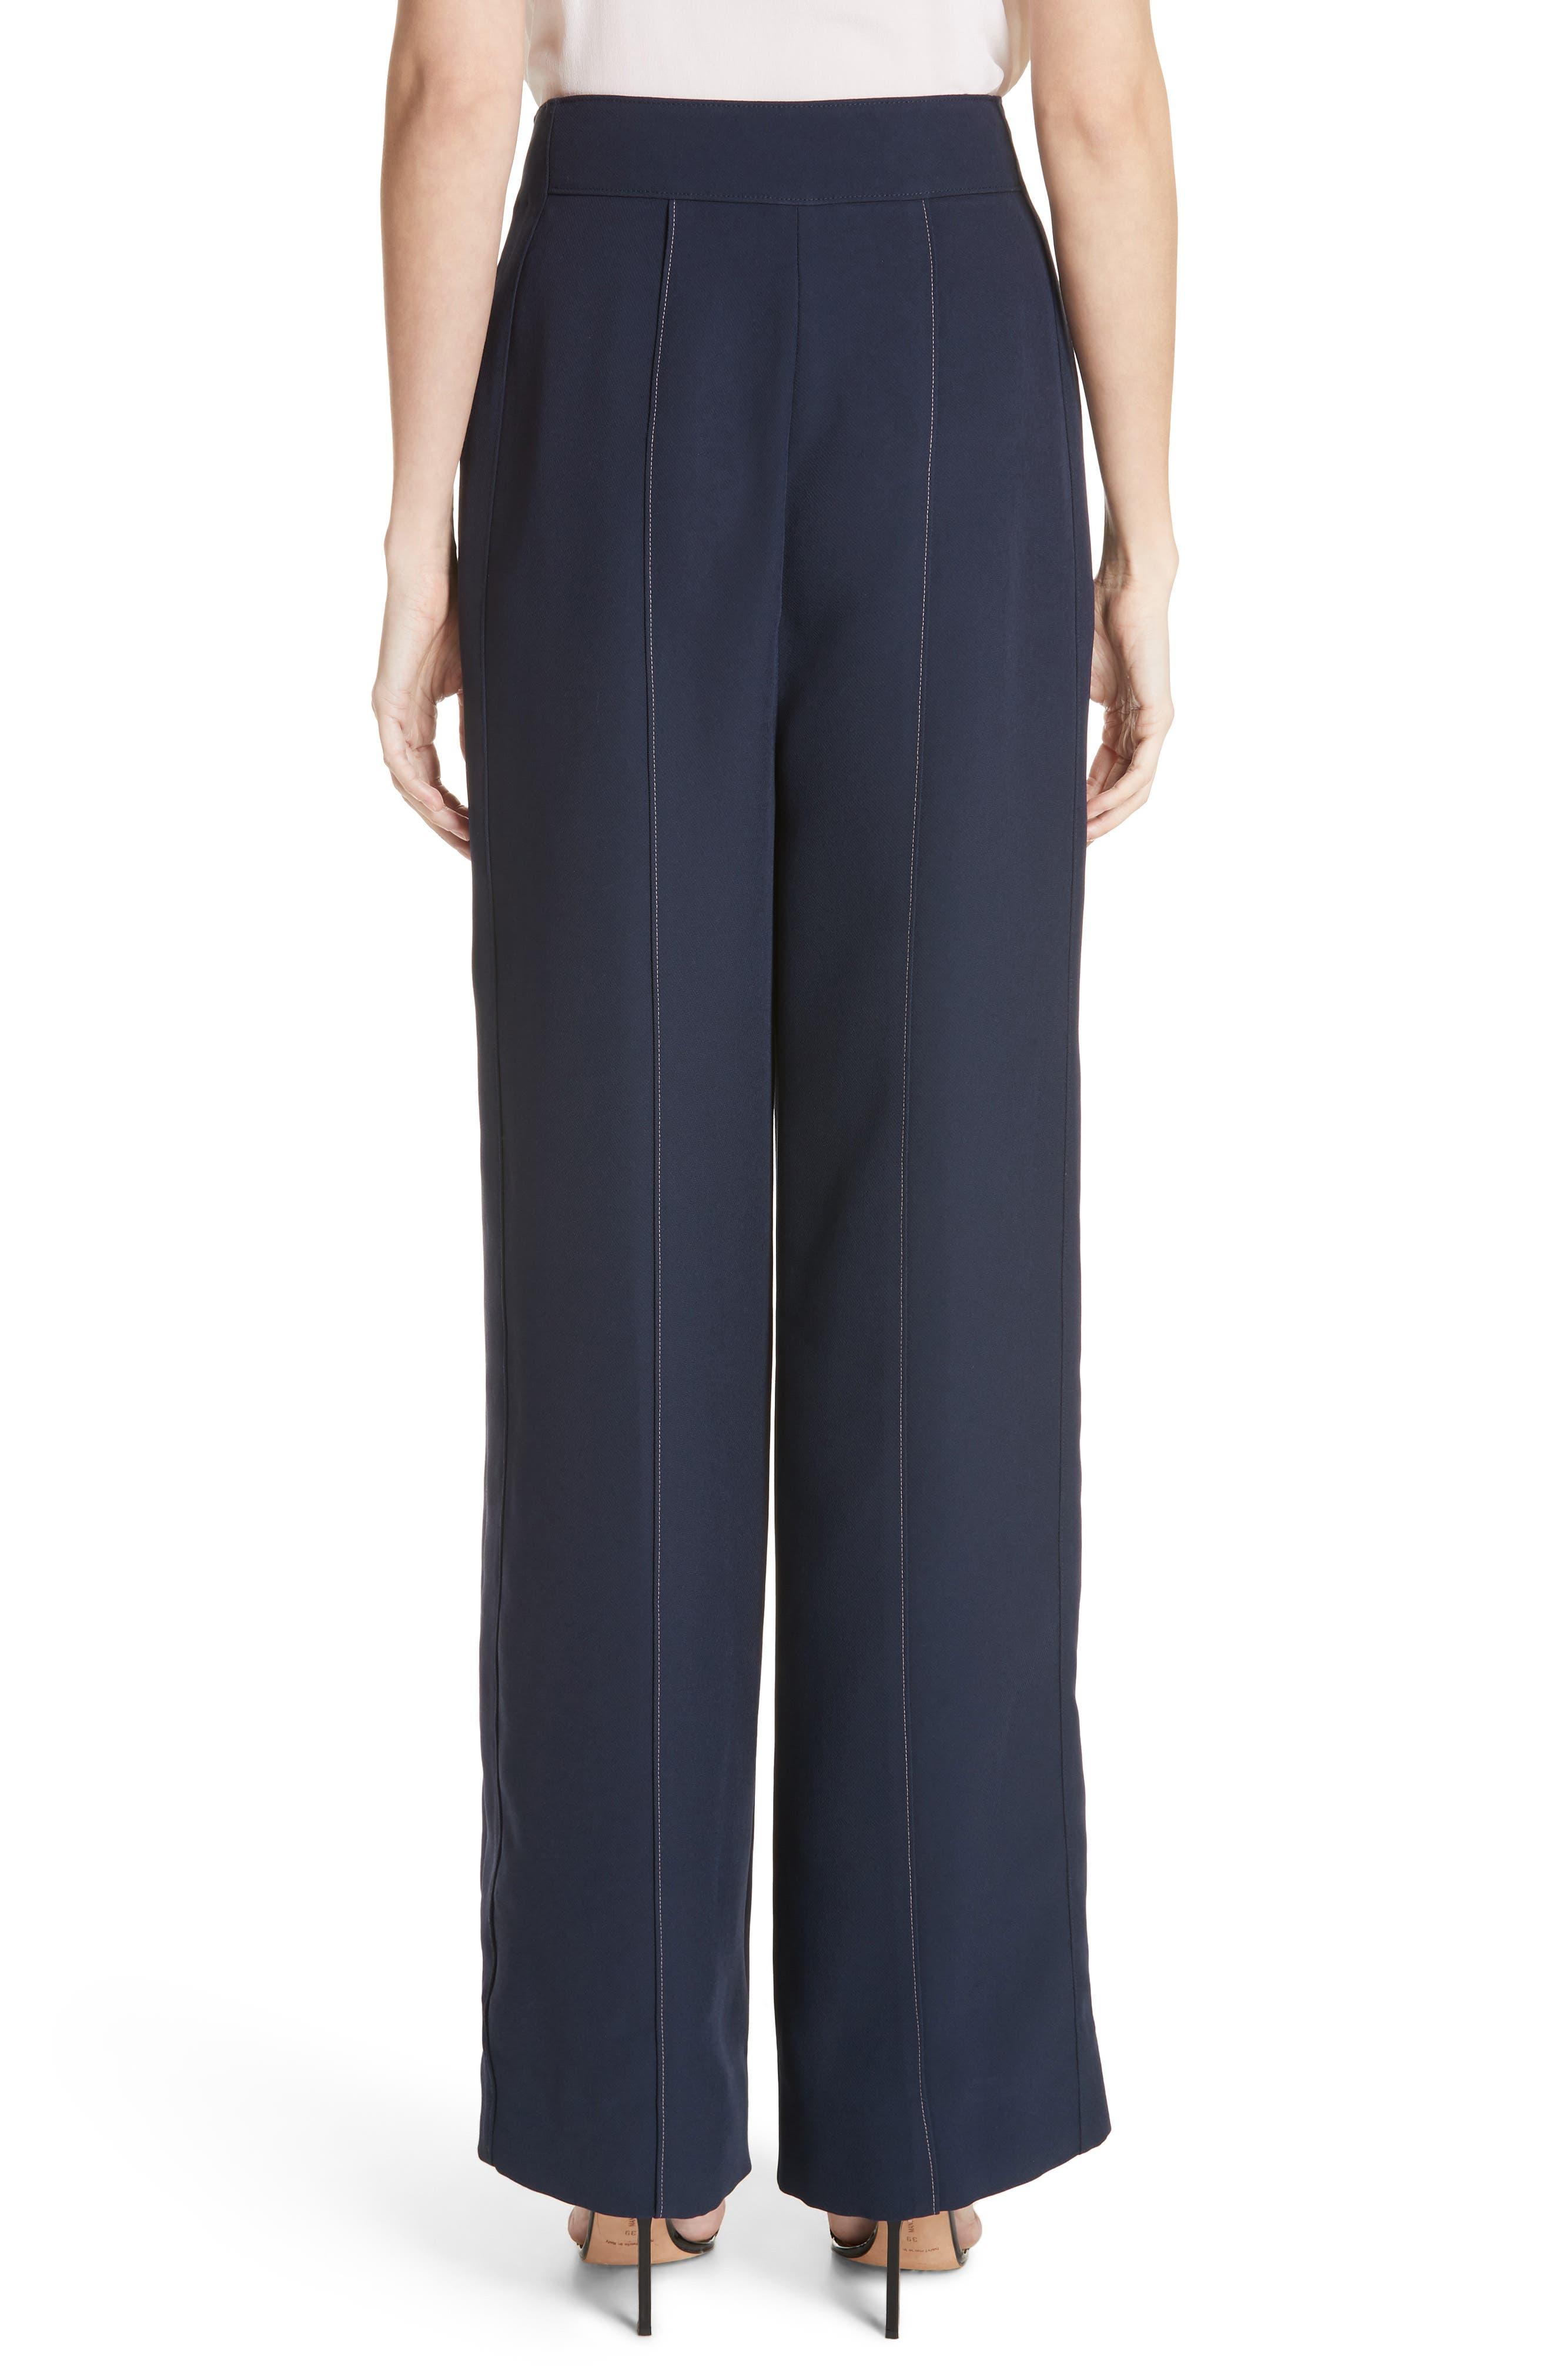 Lapari Pintuck Trousers,                             Alternate thumbnail 2, color,                             400